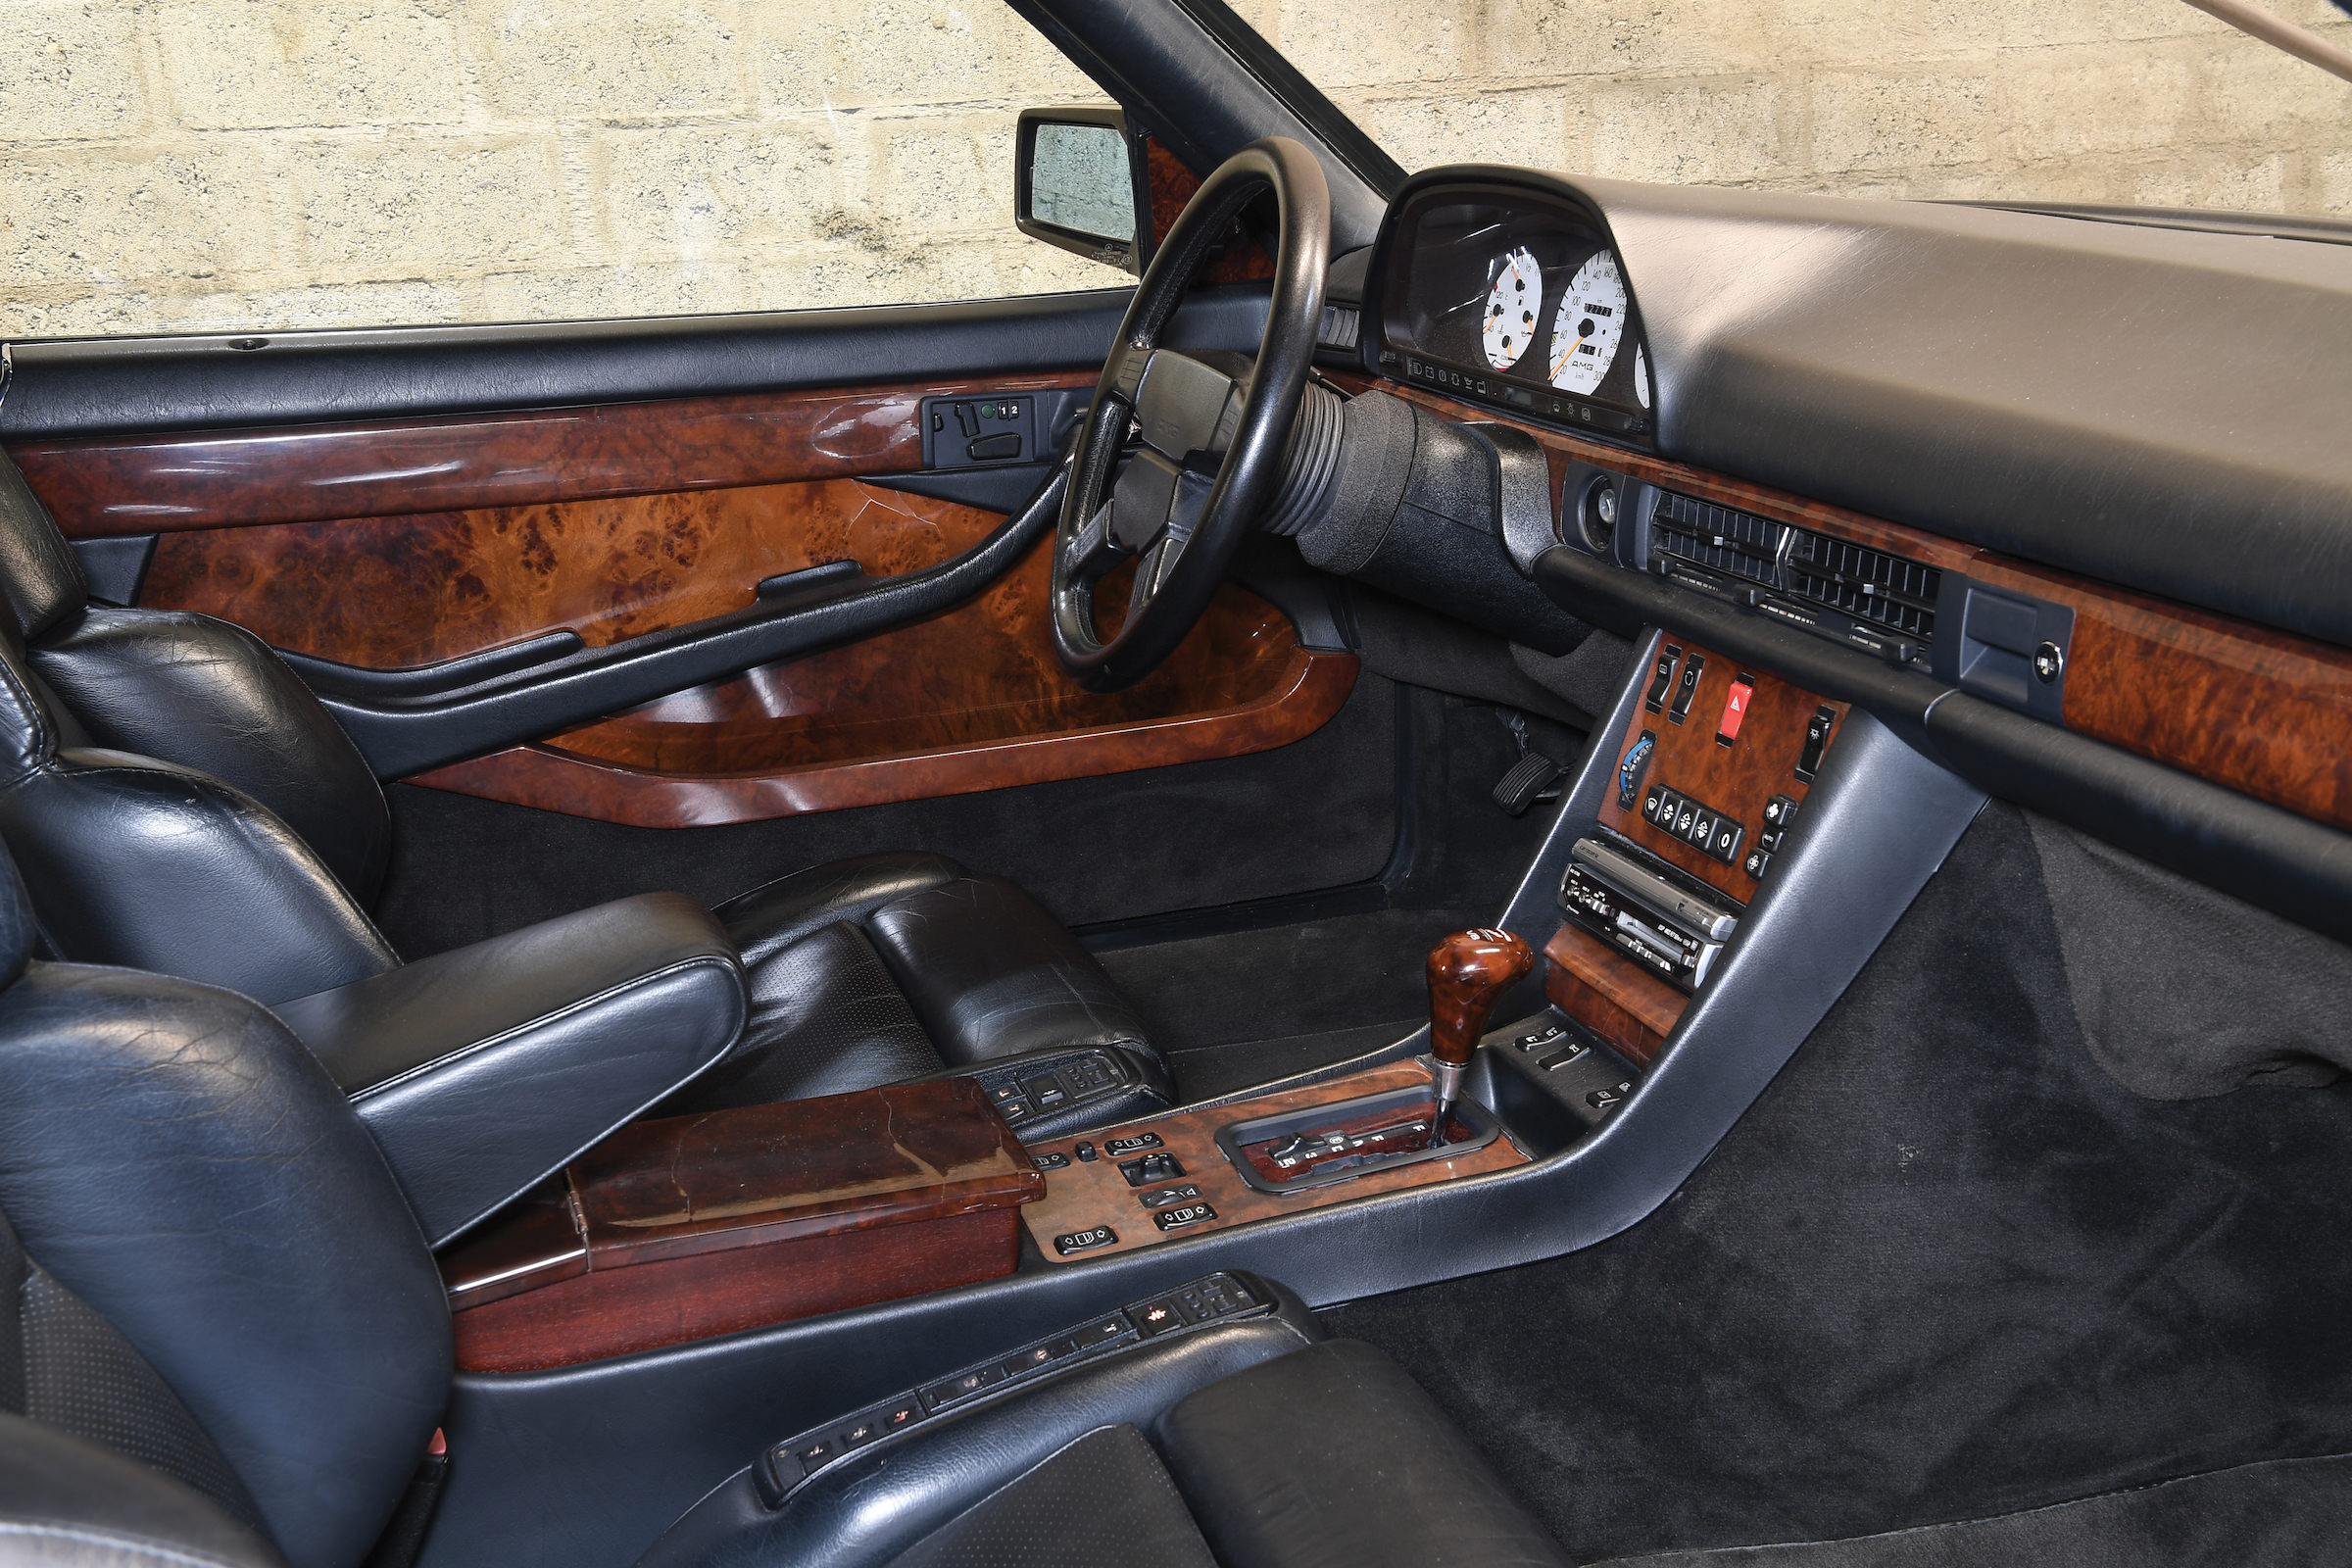 Mercedes-Benz 560 SEC AMG 6 0 Wide-Body - 385 HP German GT